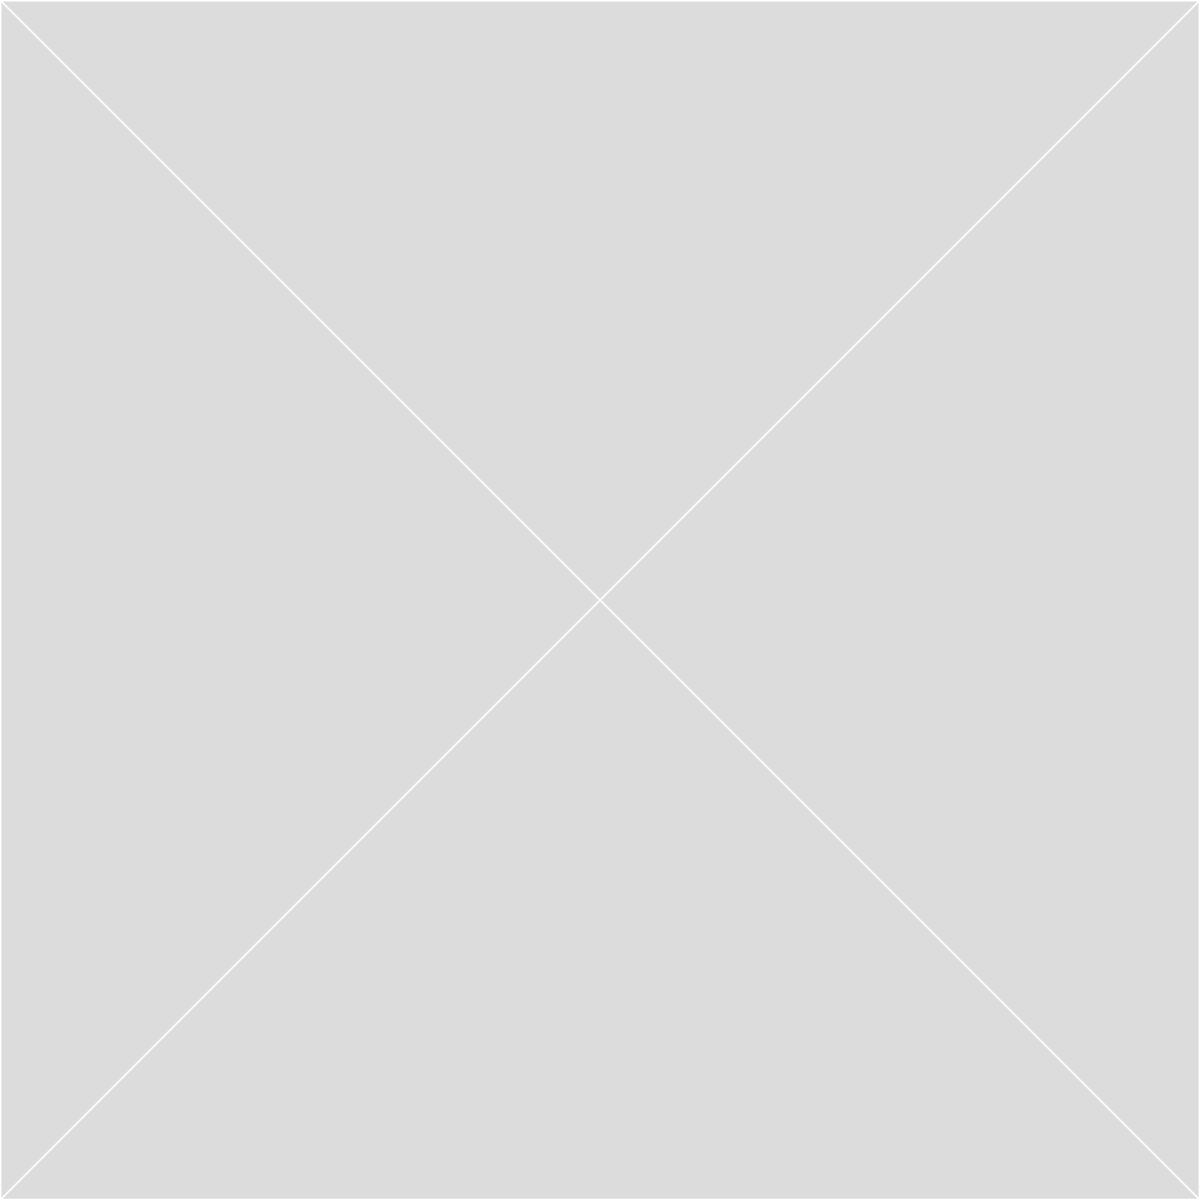 Daftar Harga Blazer Grey Stylist Update 2018 Produk Ukm Bumn Jaquard Revenge Solid Jhilburn